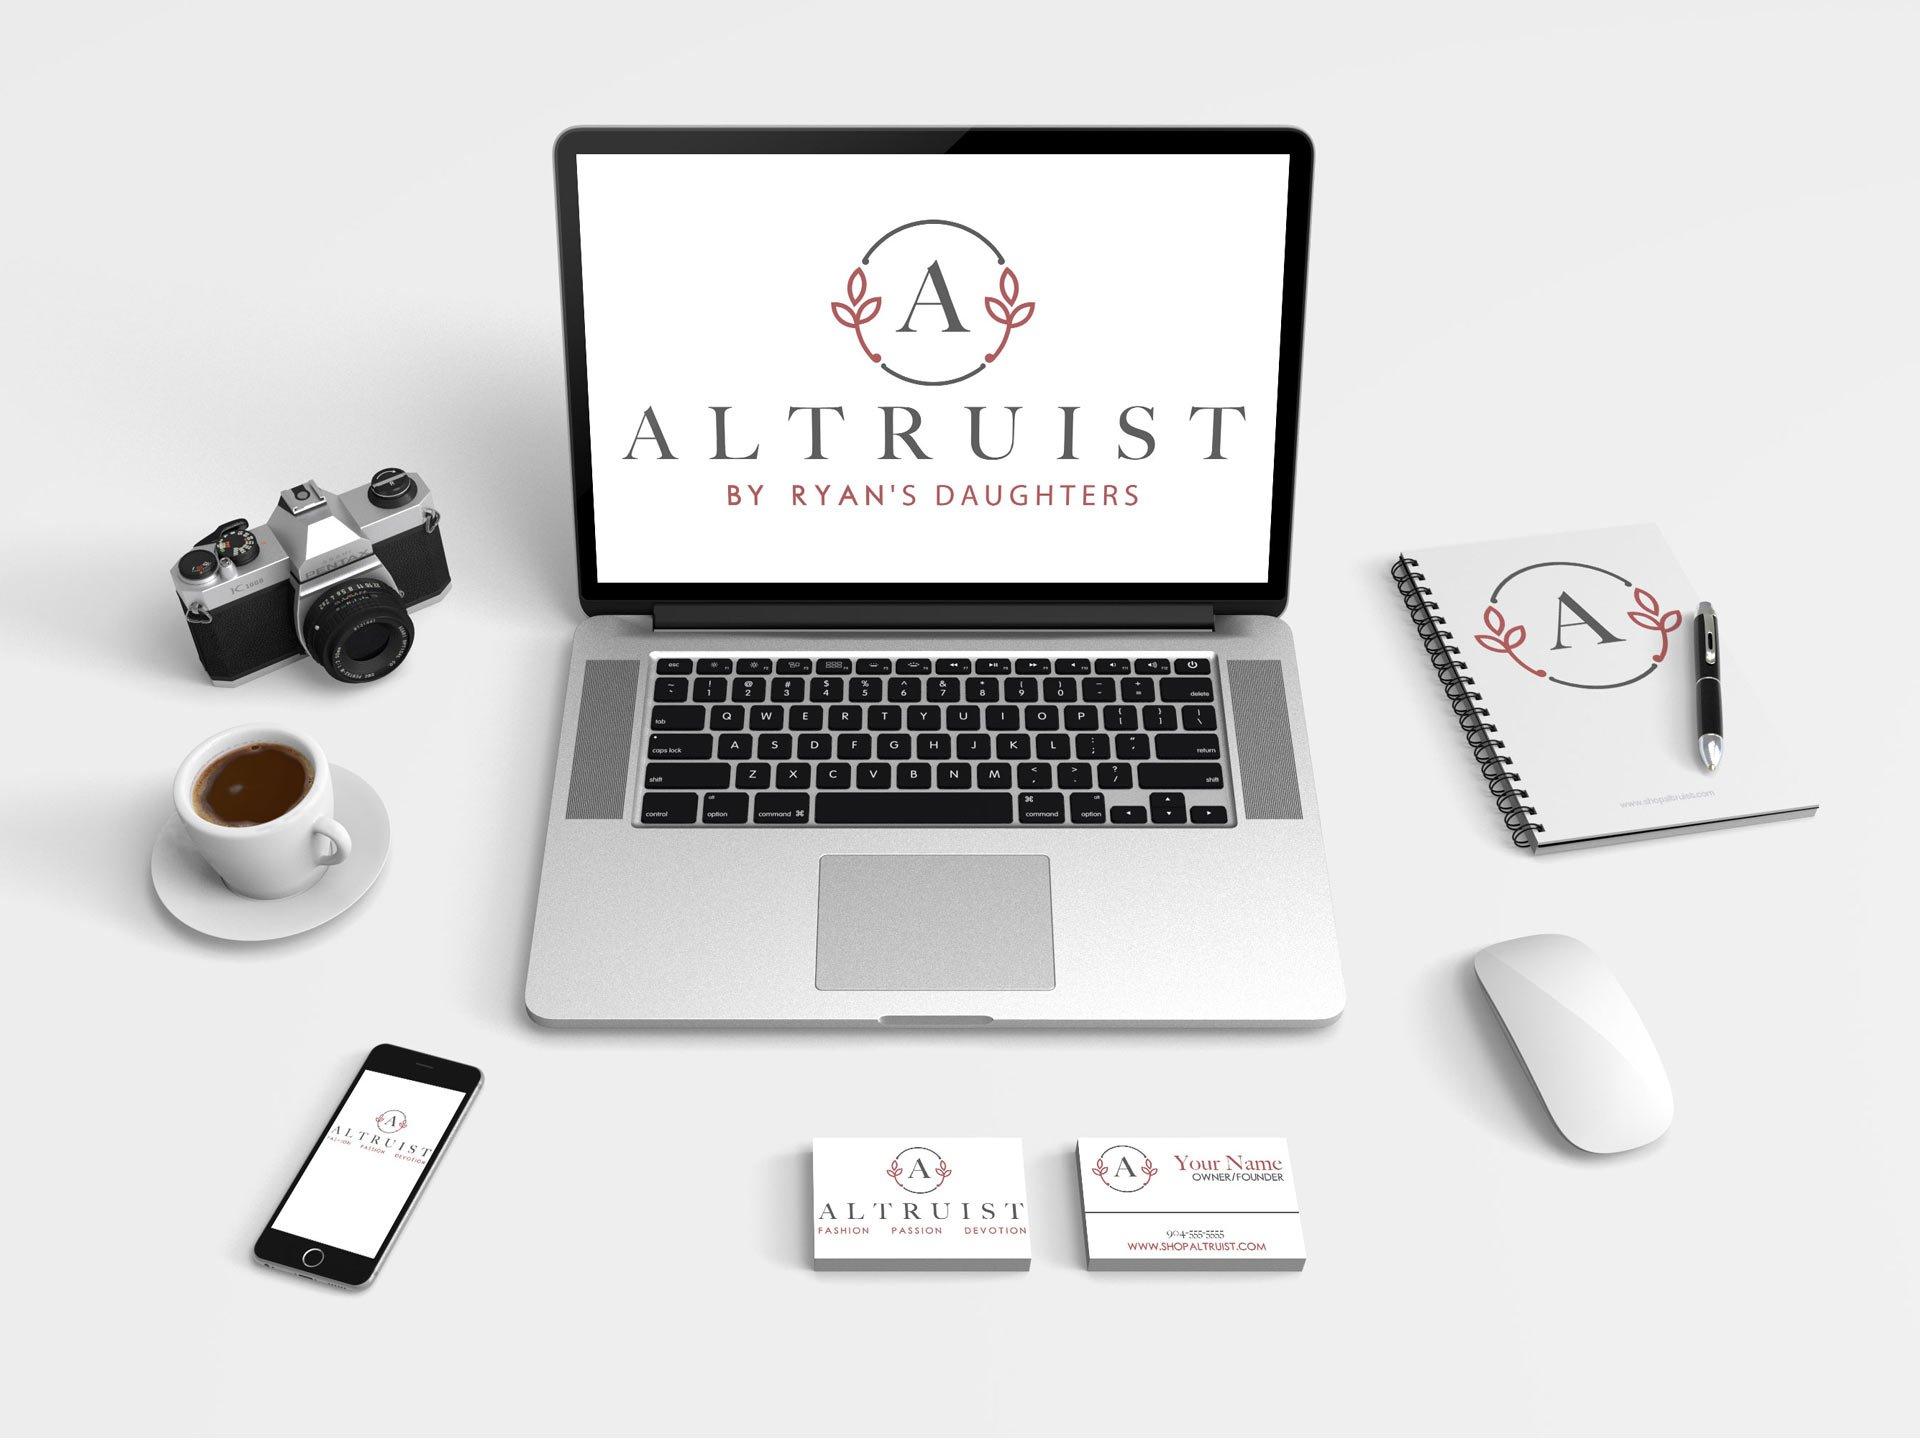 altruist logo design